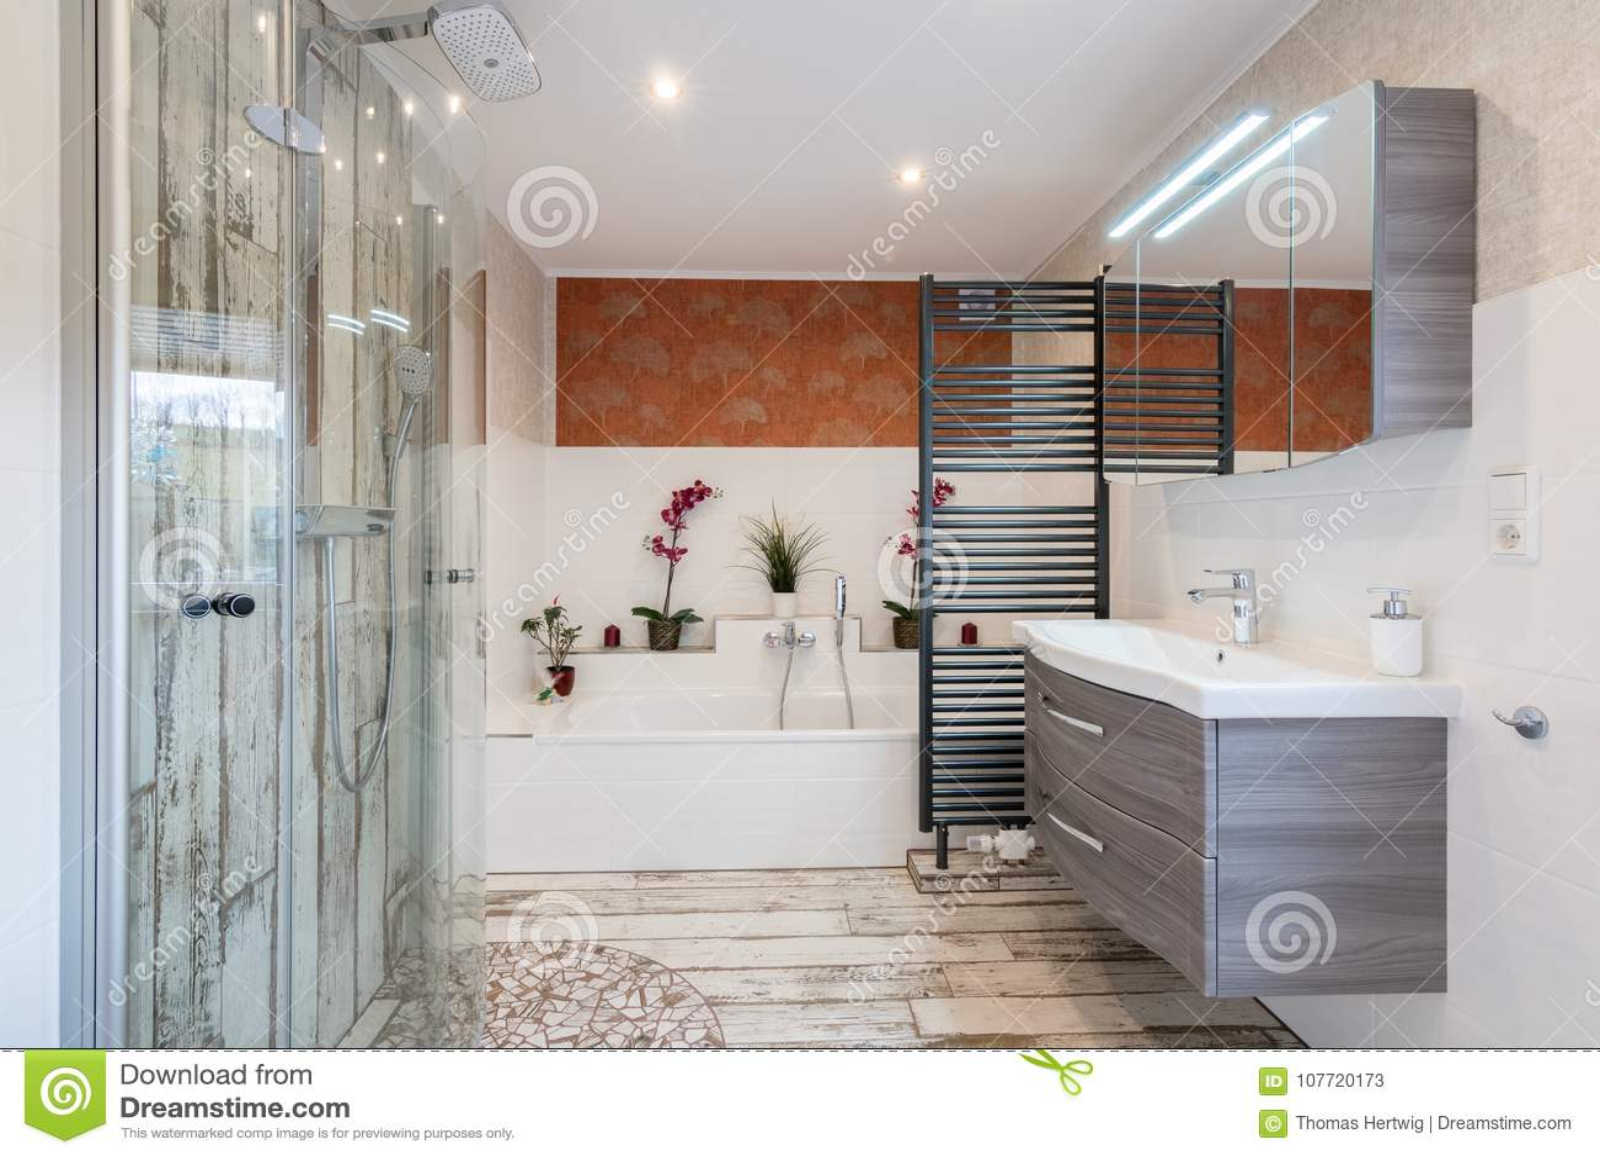 Modern bathroom in vintage style with sink, bathtub, glass shower and black towel dryer